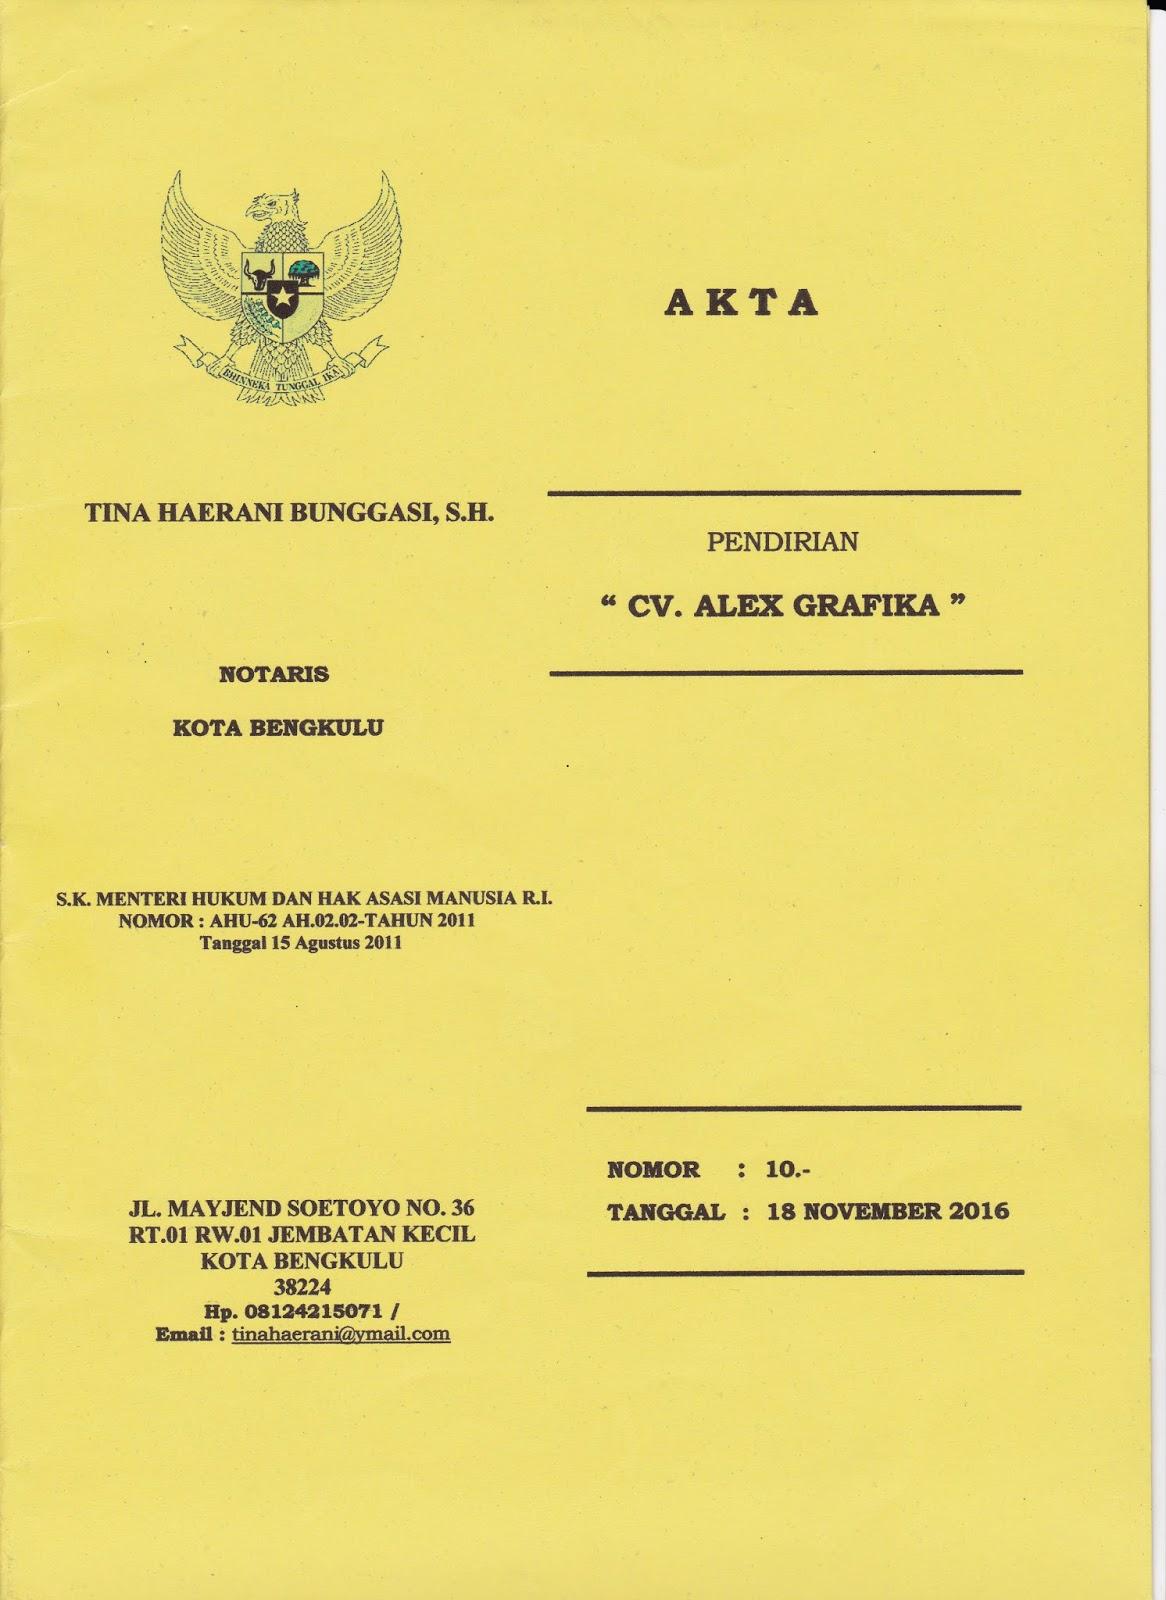 Akta Pendirian CV. ALEX GRAFIKA